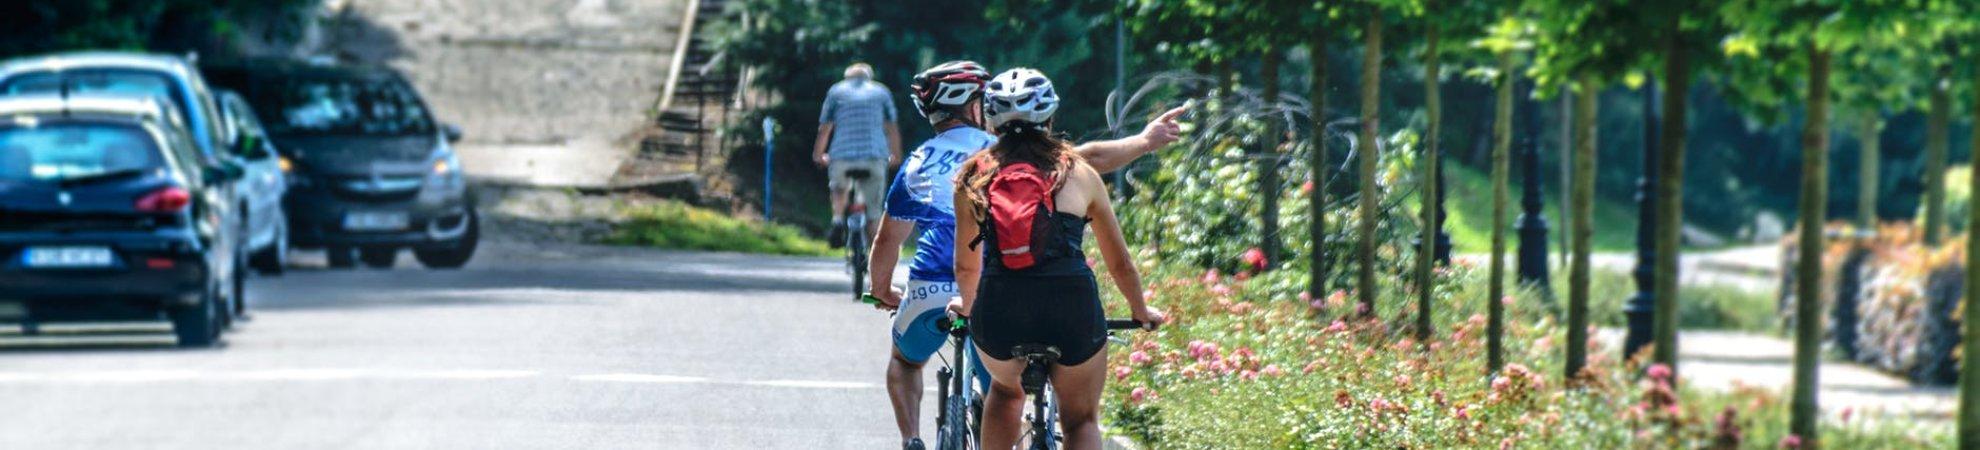 north dublin cycle path